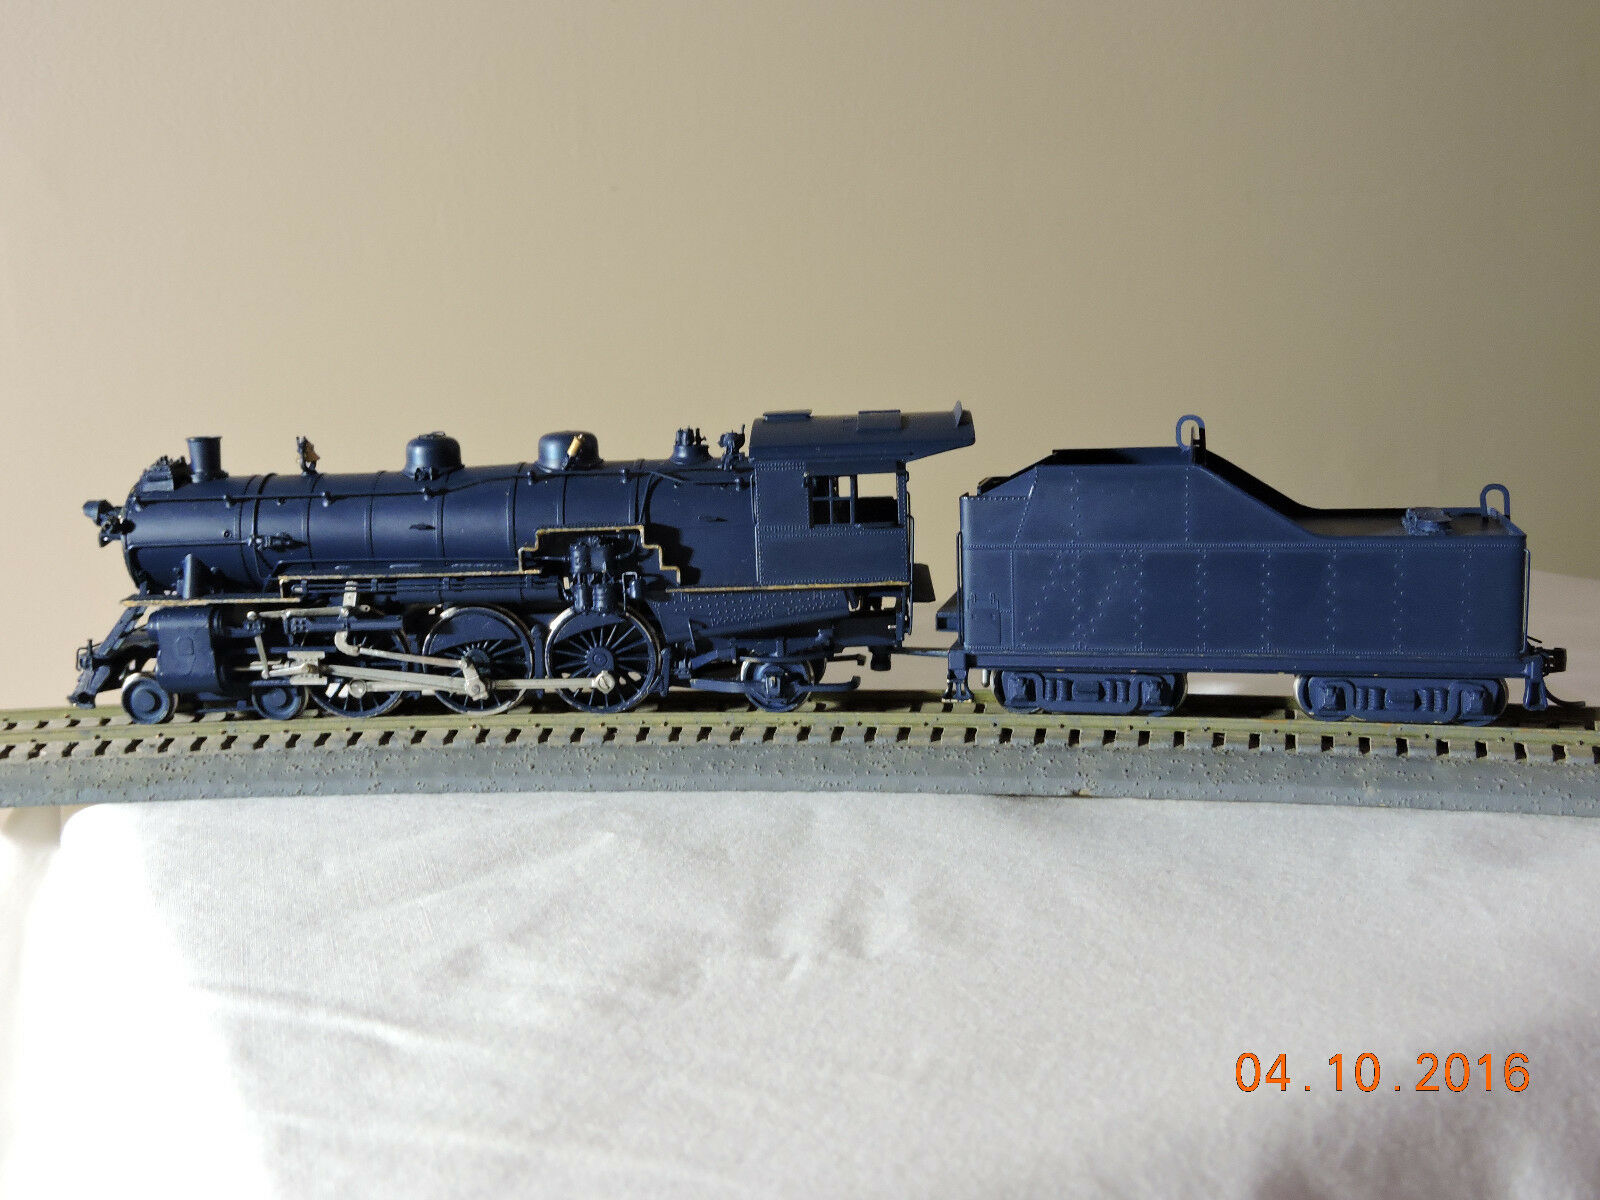 Locomotora de cobre Ho - scale Oeste   nakamuru J - 1 Pacífico 4 - 6 - 2 (DC)